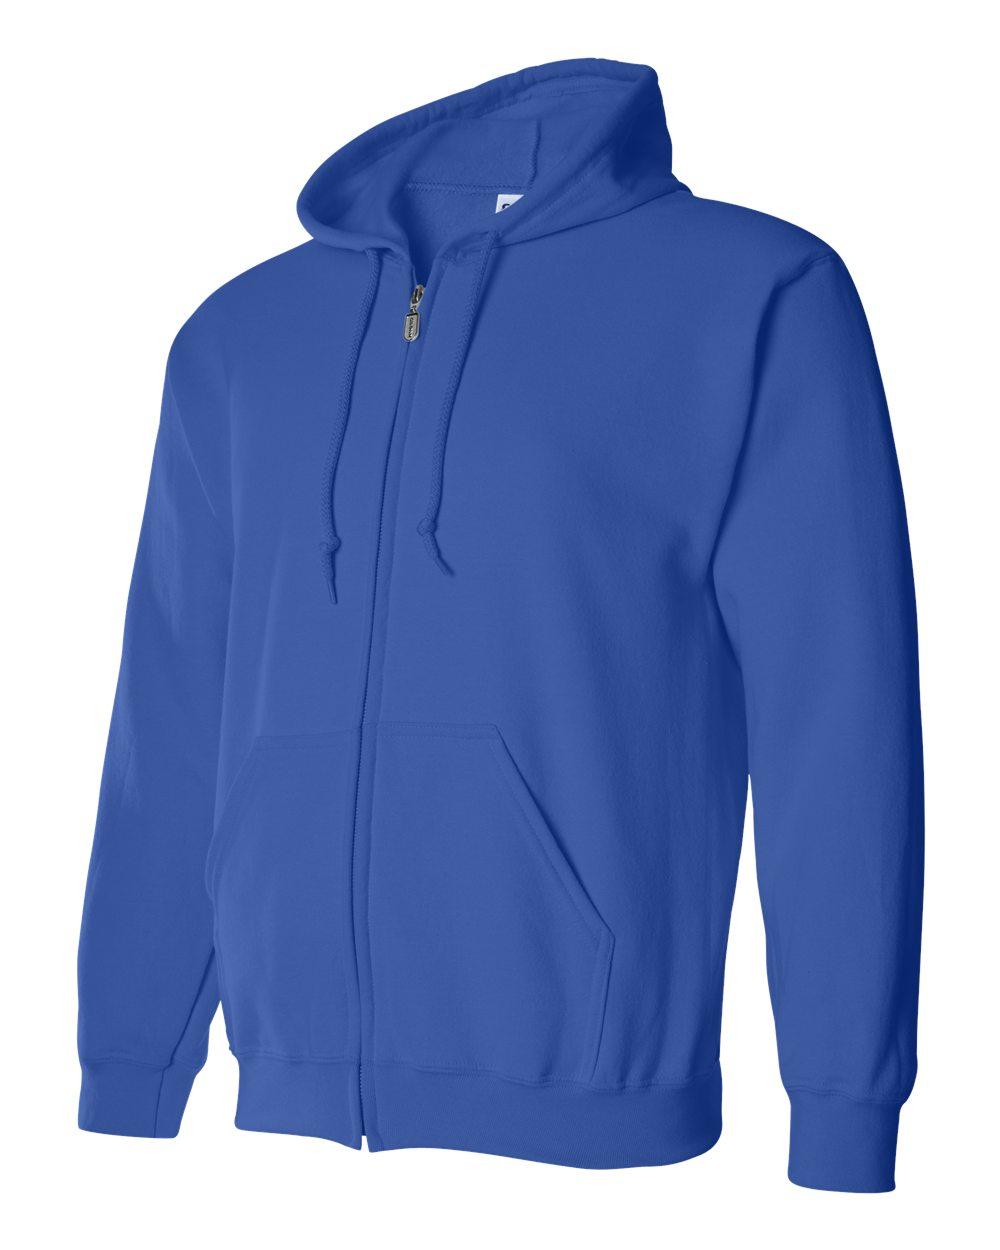 GIL18600 Royal Blue